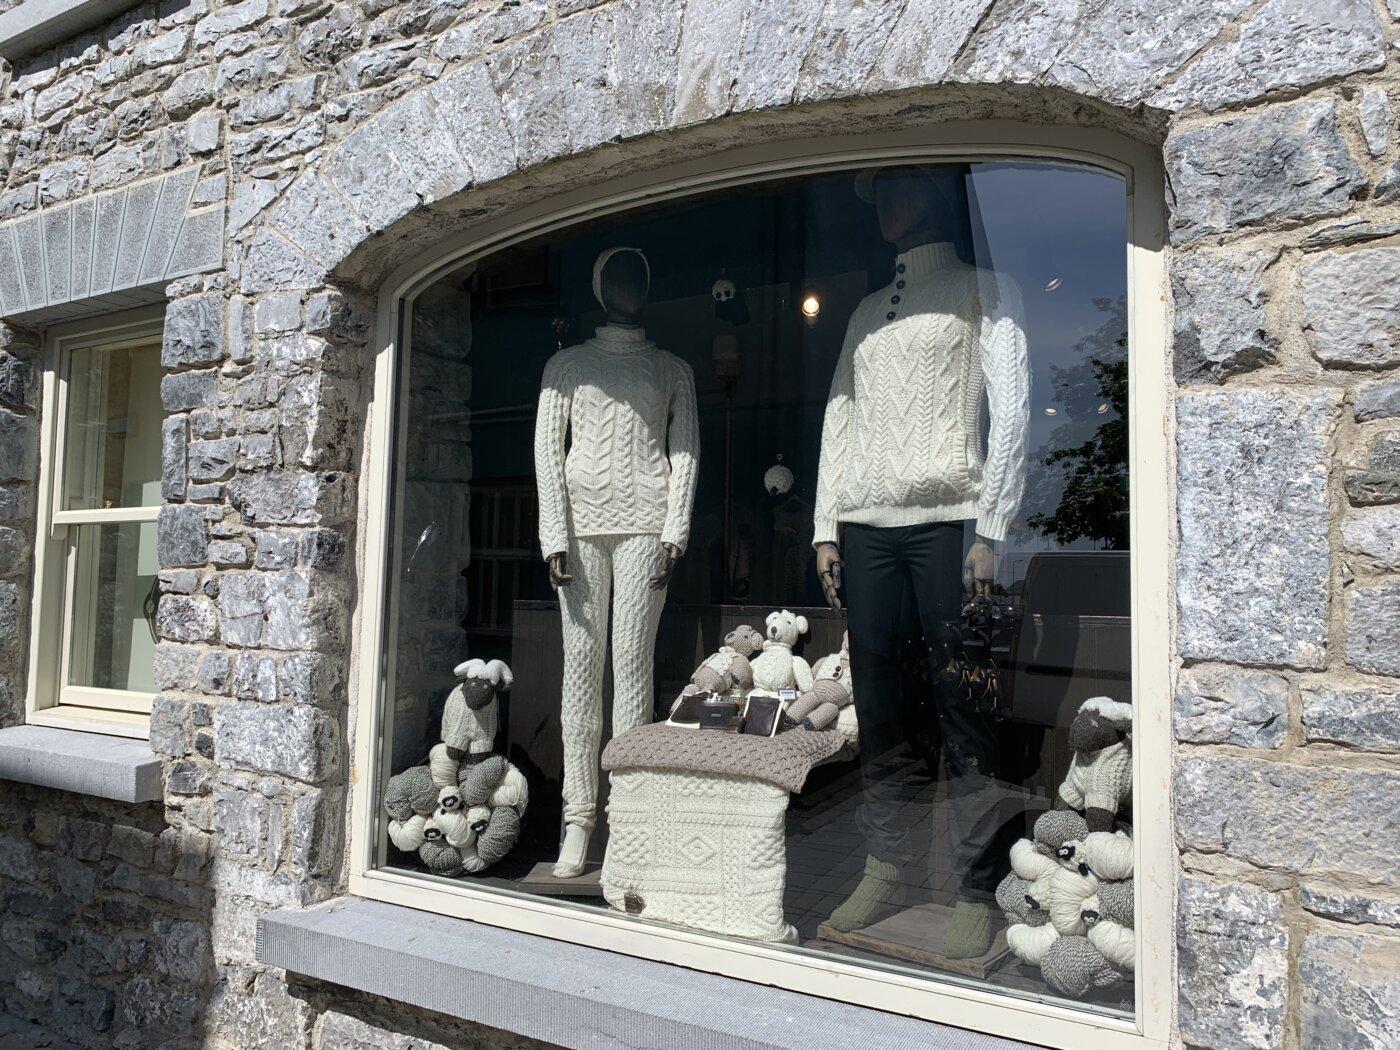 Zopfmusterpullover in Irland